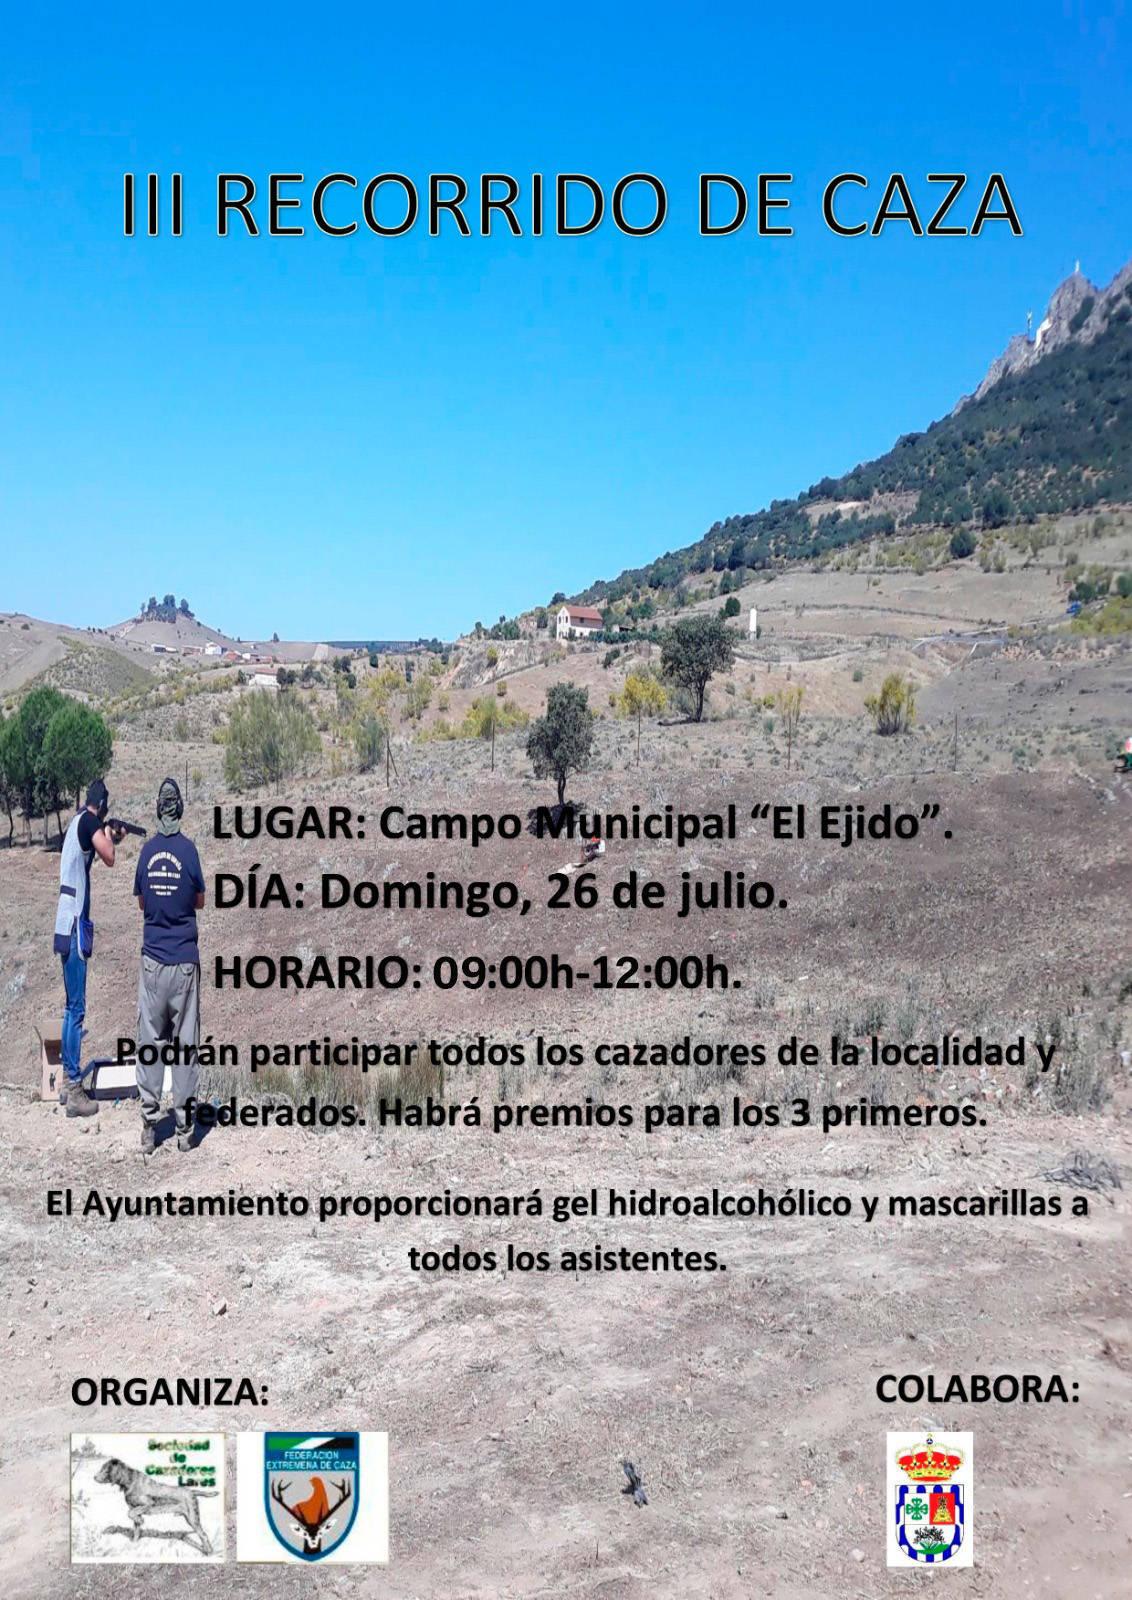 III recorrido de caza - Esparragosa de Lares (Badajoz)